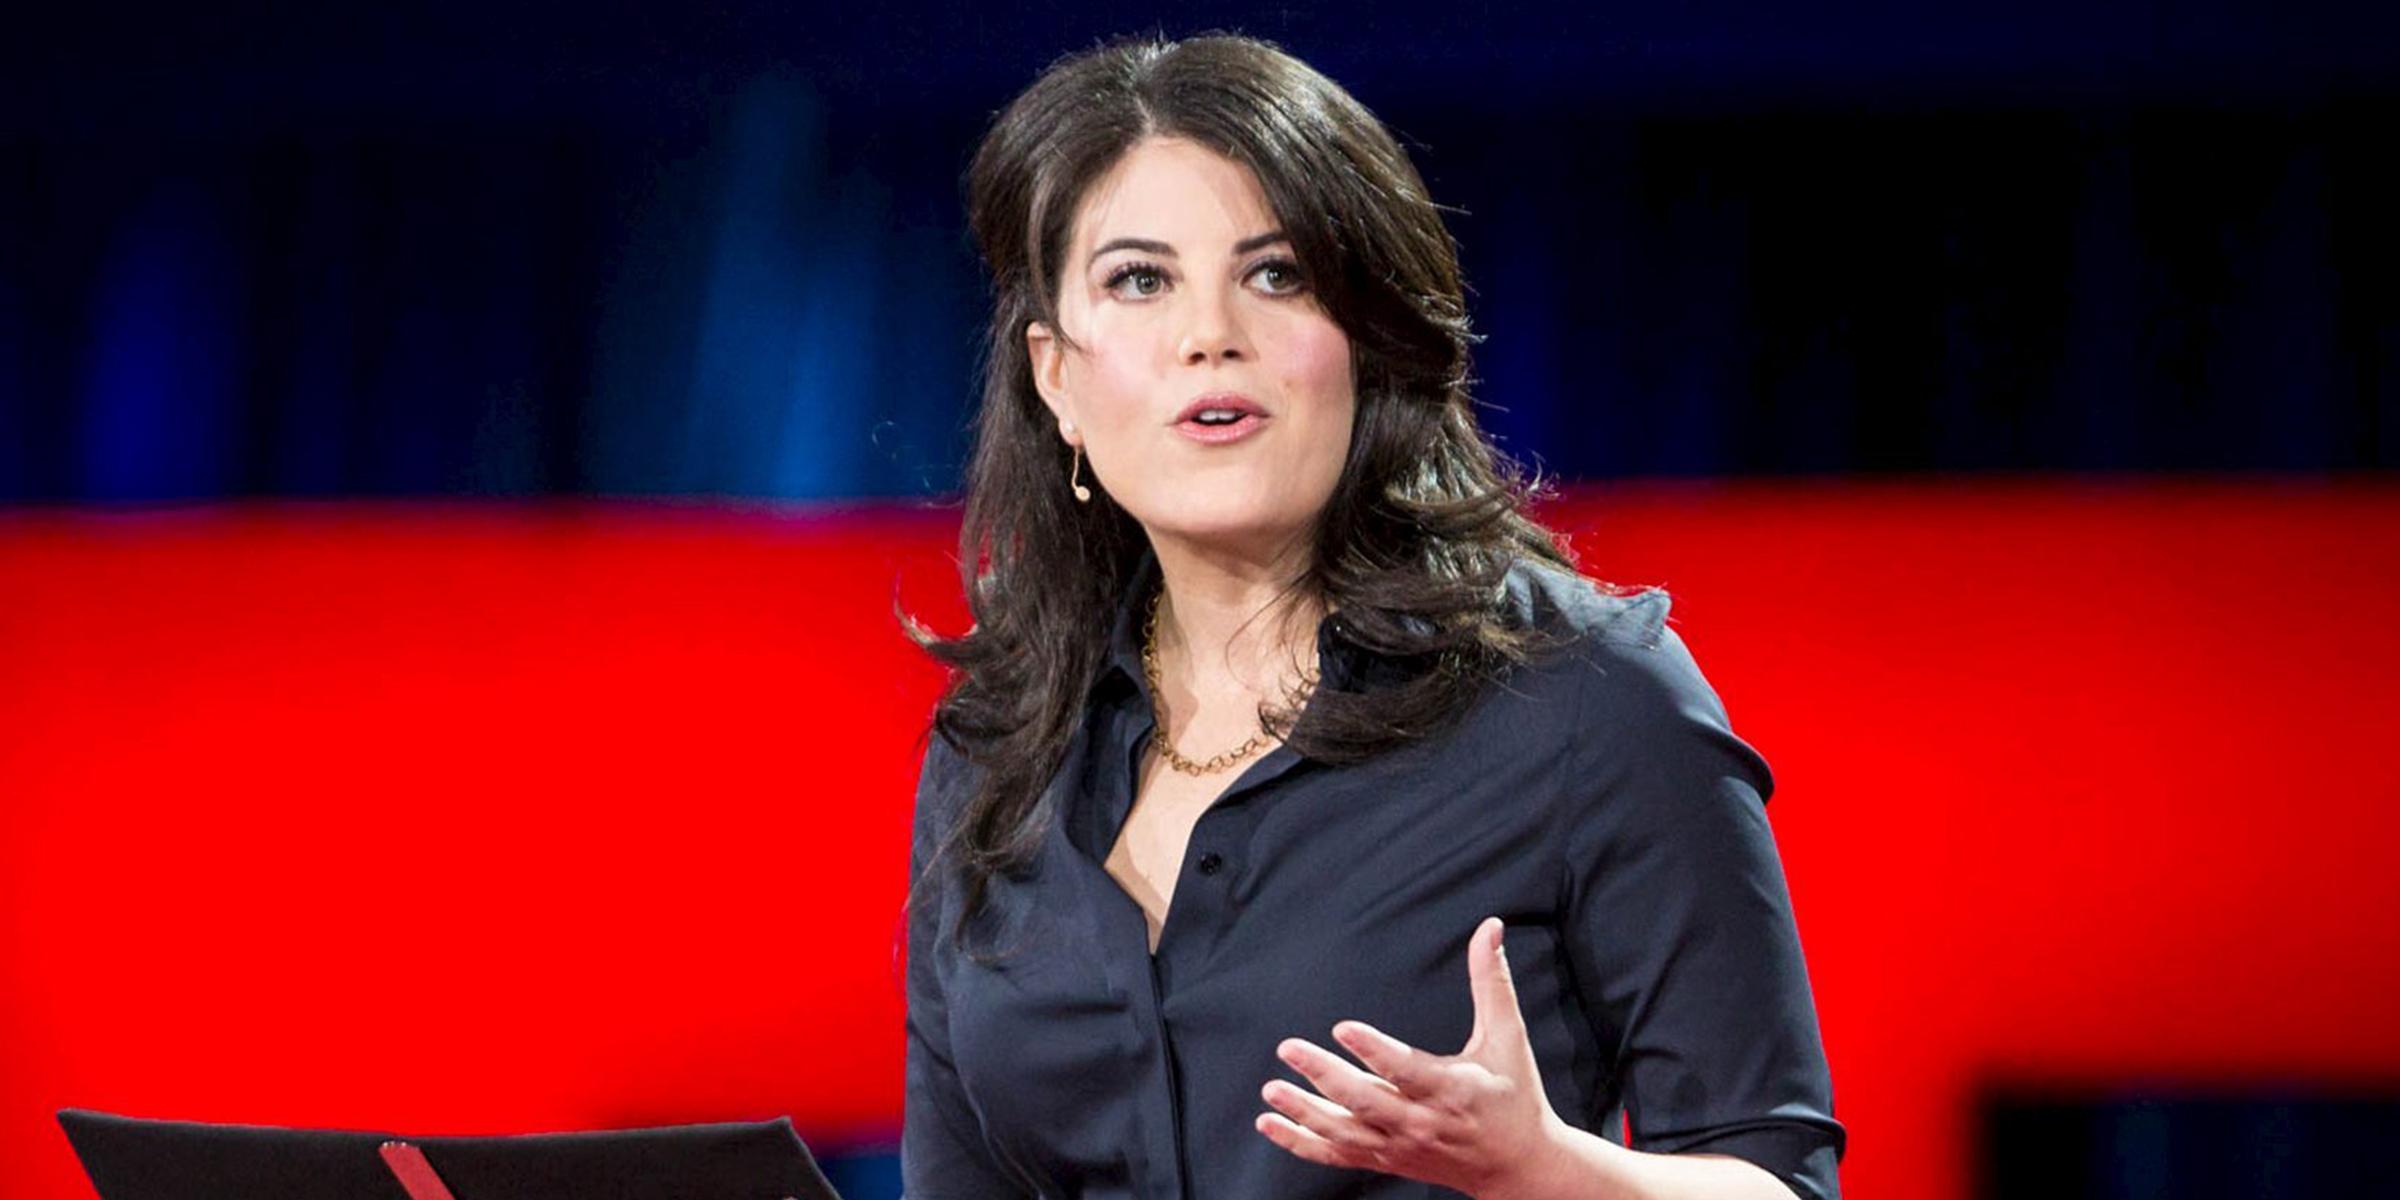 Monica Lewinsky unveils powerful cyberbullying PSA, 'The Epidemic'